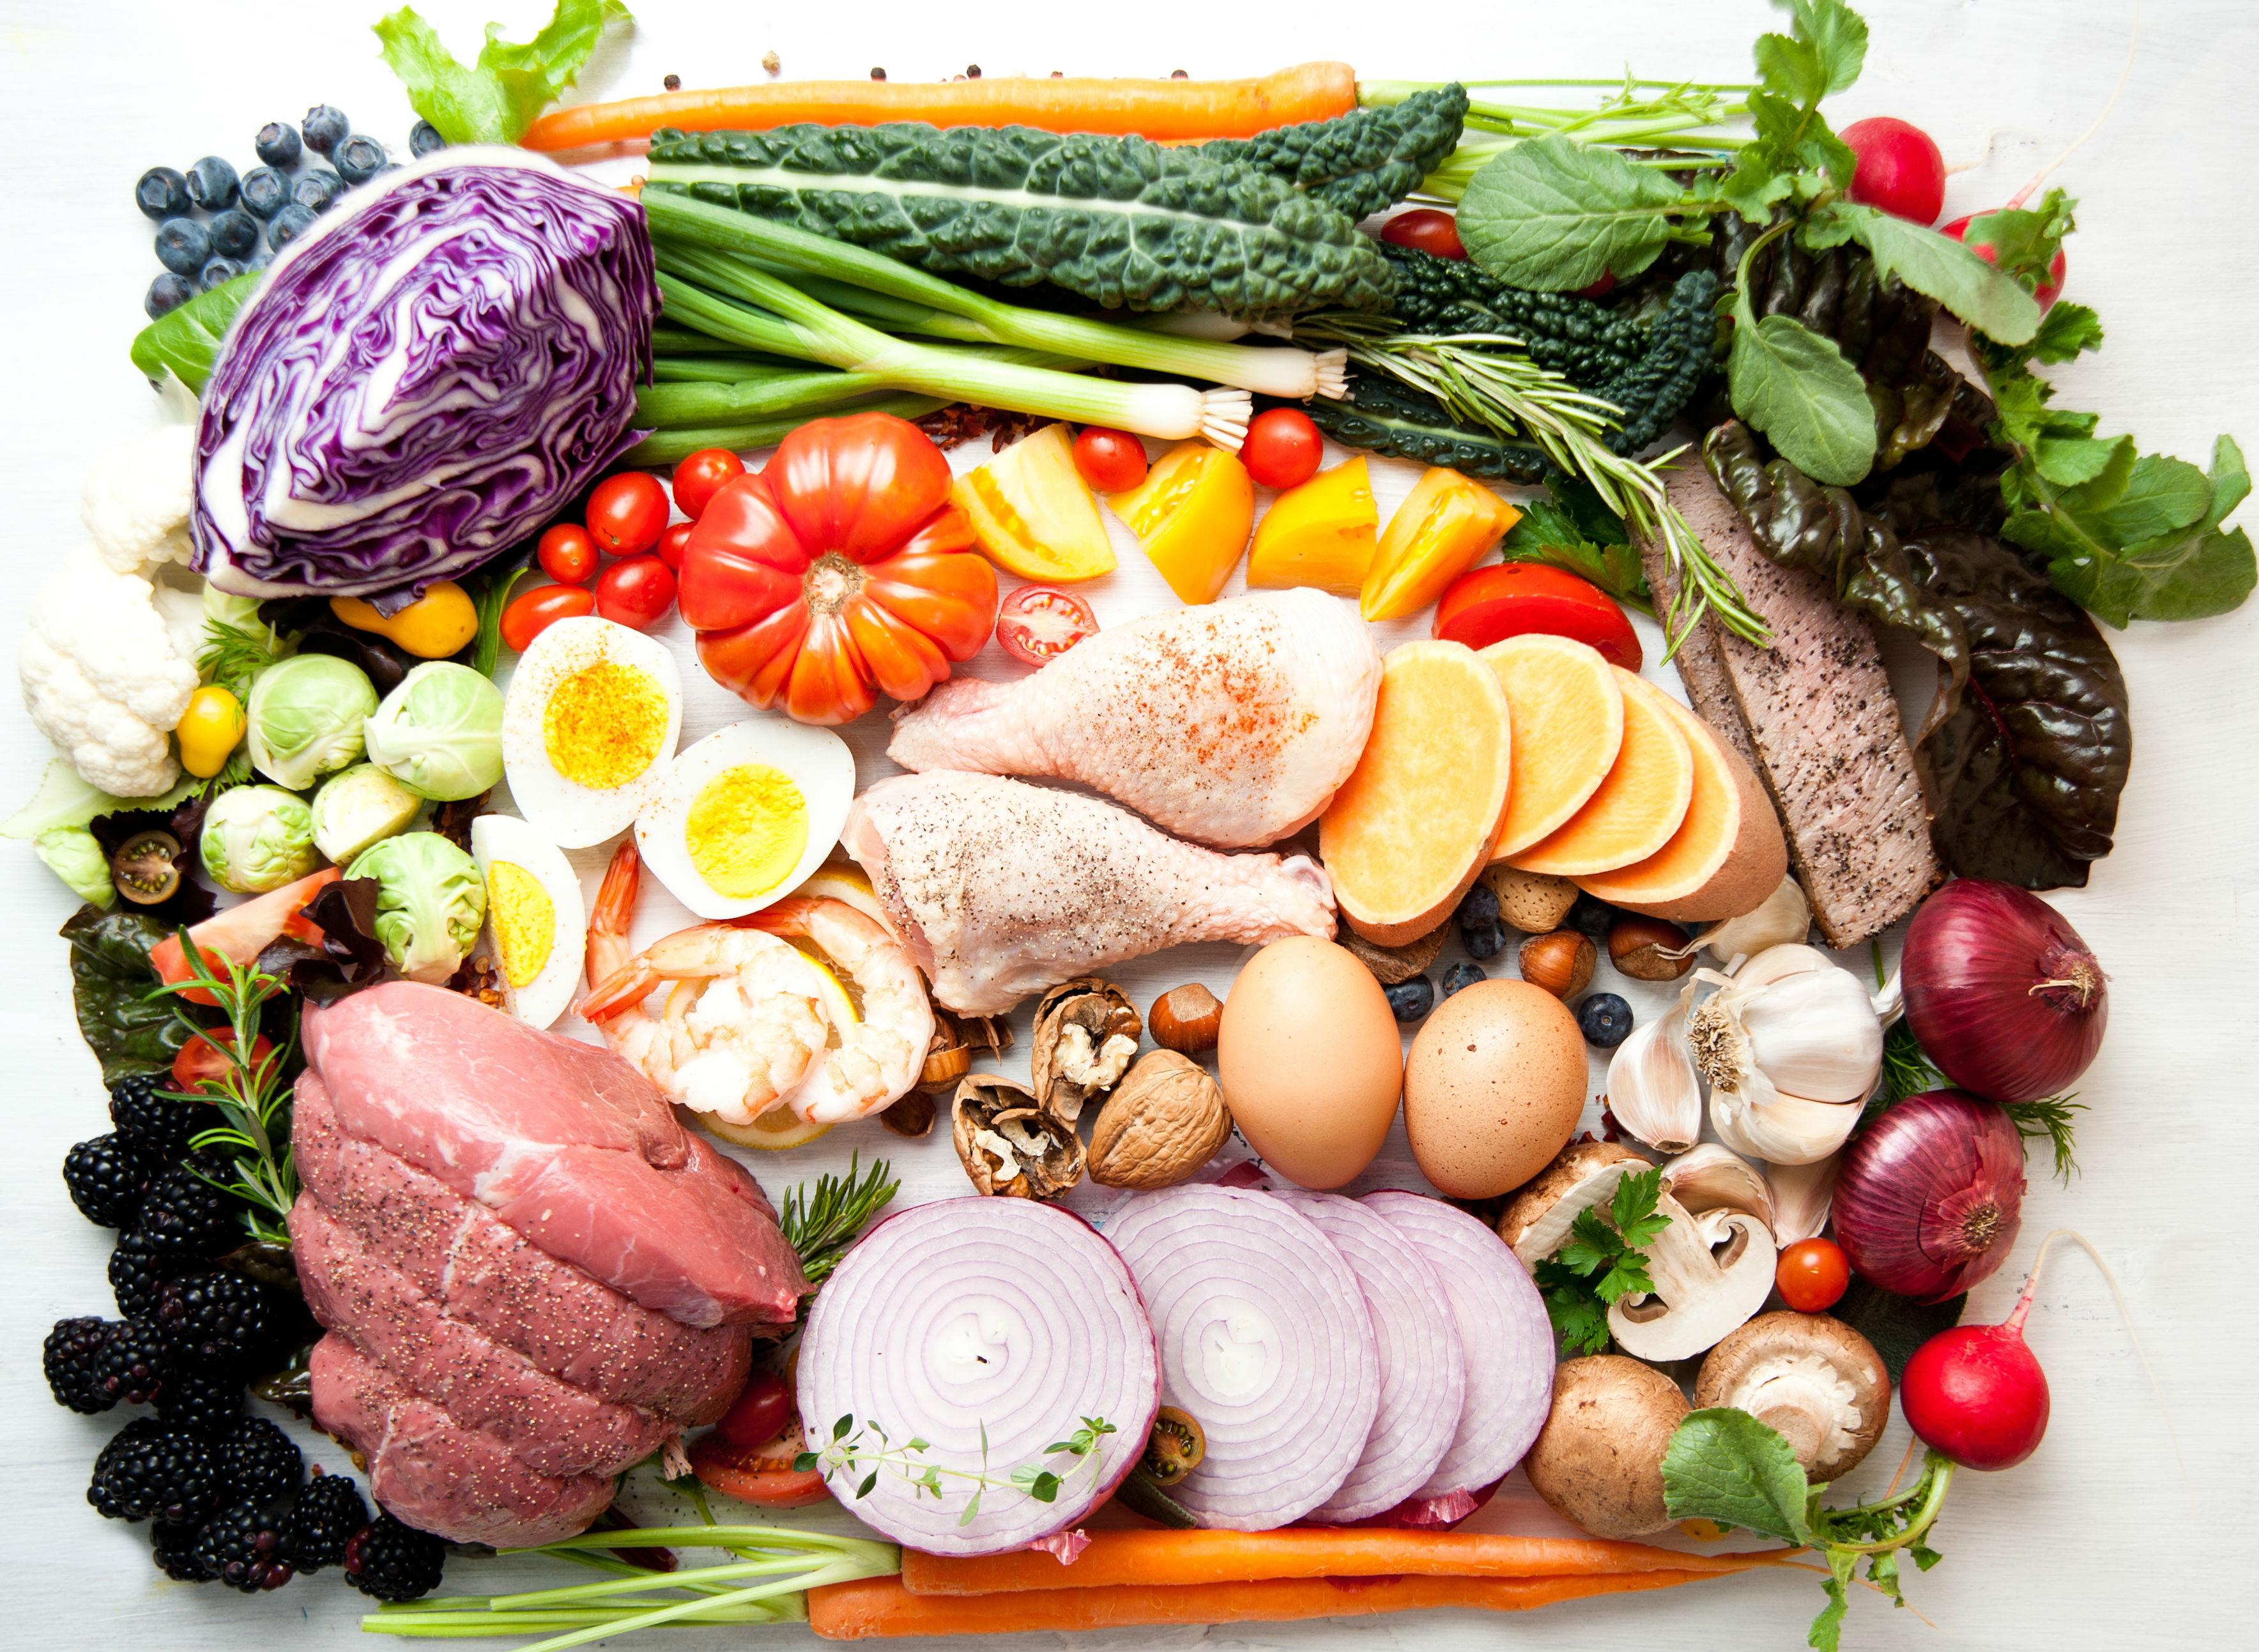 Menopausa, dieta paleo fa dimagrire e riduce rischio diabete